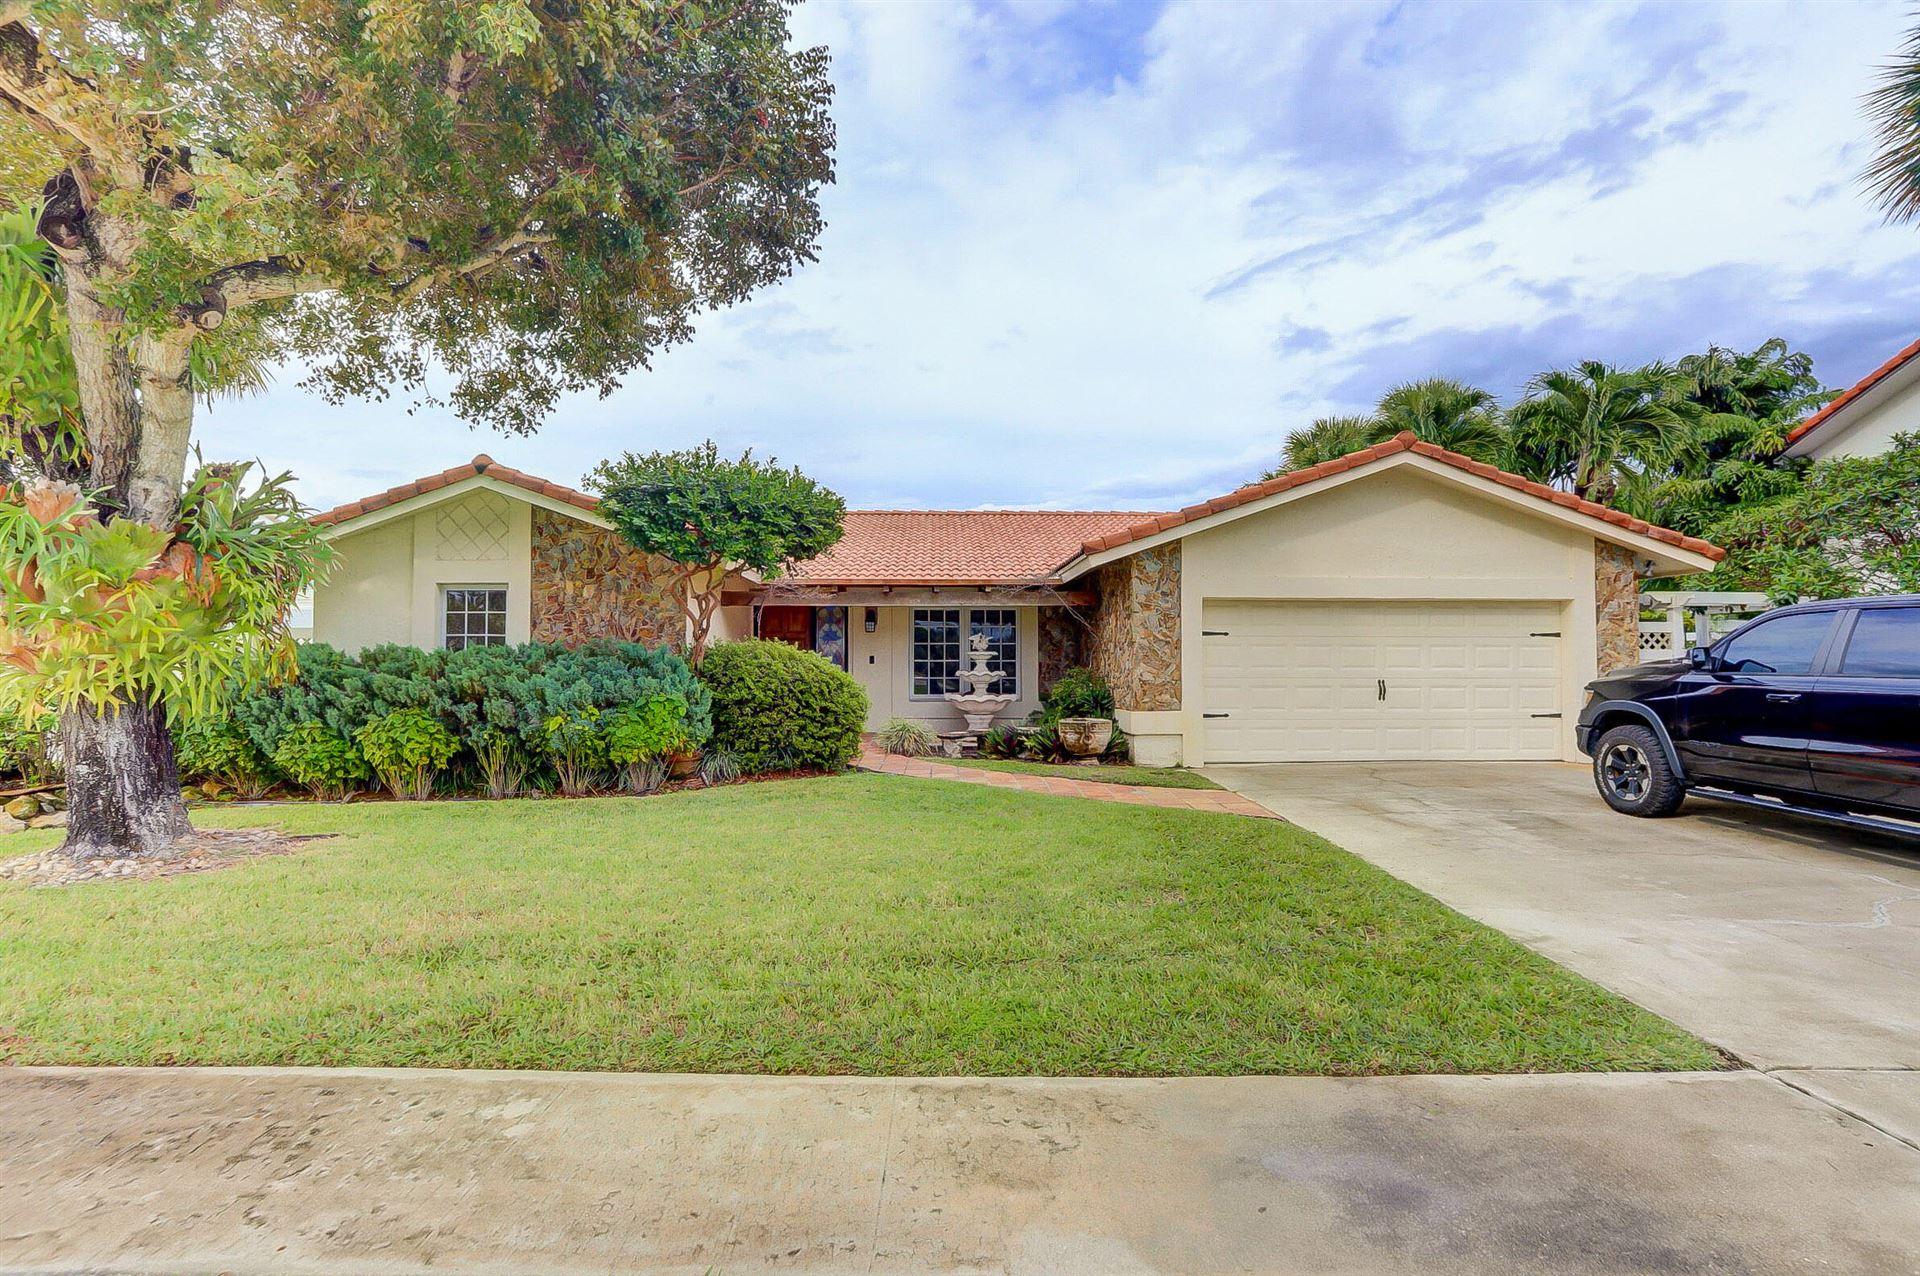 793 Camino Lakes Circle, Boca Raton, FL 33486 - MLS#: RX-10753685